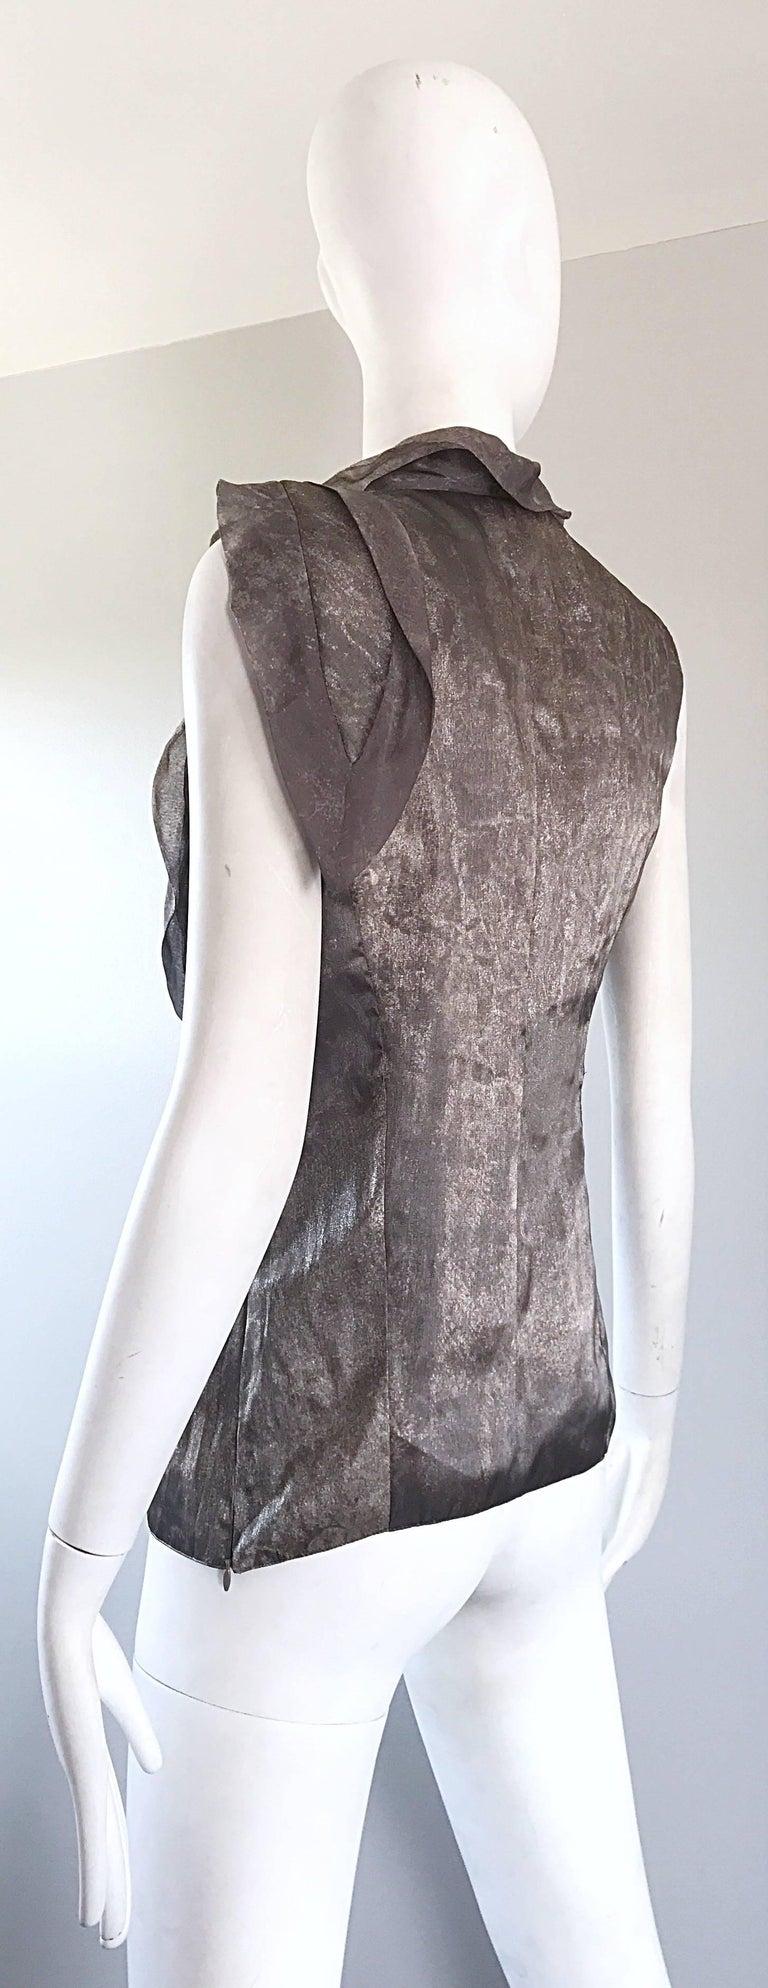 Giorgio Armani 1990s Silver Gunmetal Avant Garde Vintage 90s Silk Blouse Top For Sale 3